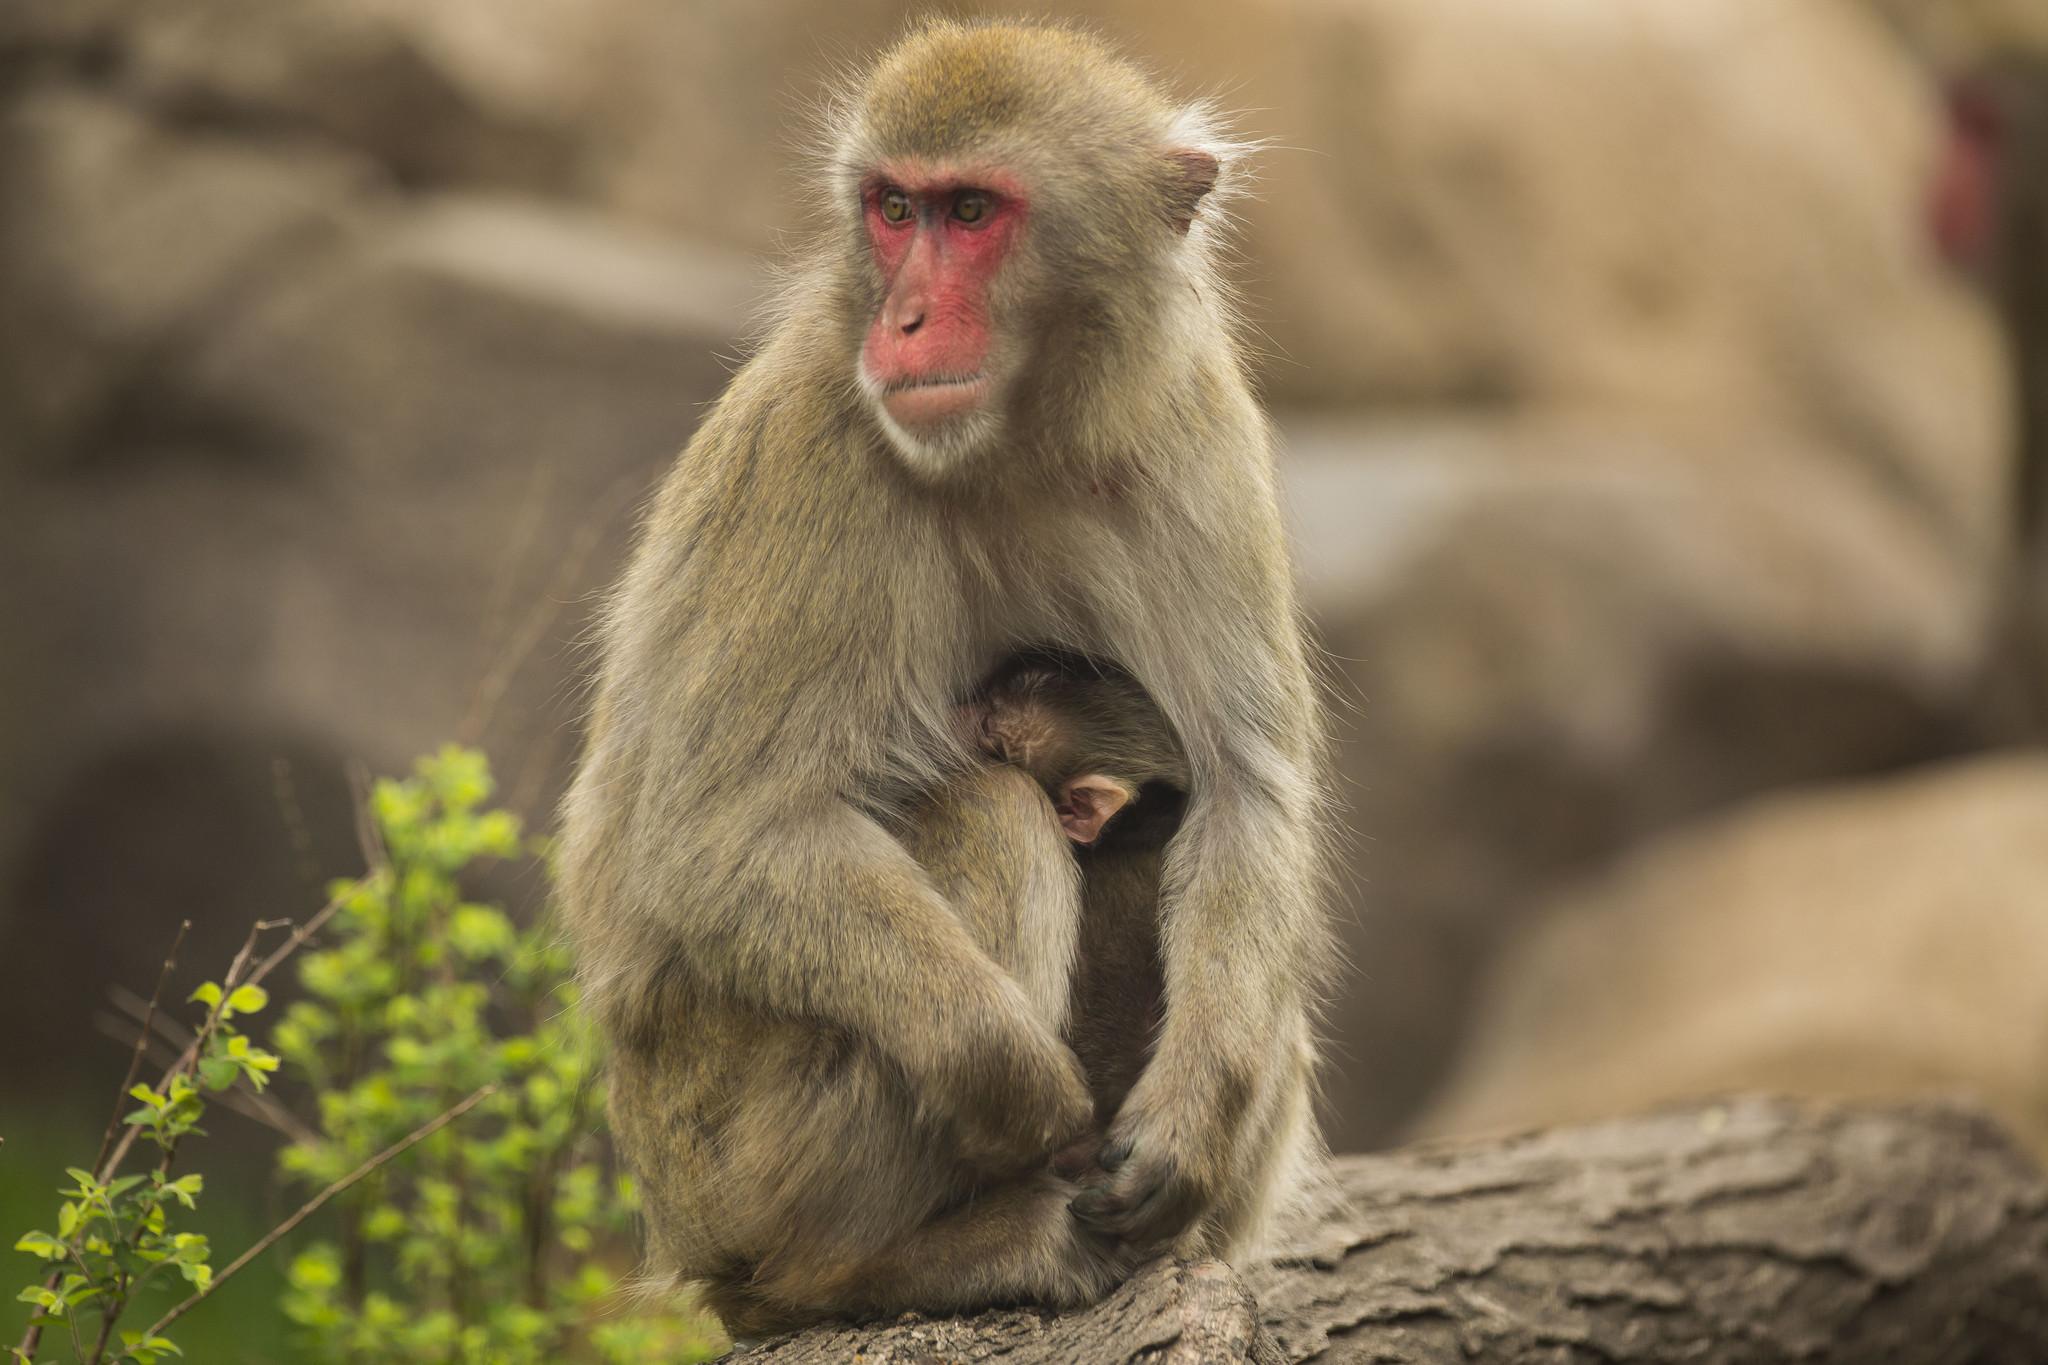 Monkey Kingdom Baby Monkey Baby Snow Monkey is Born at